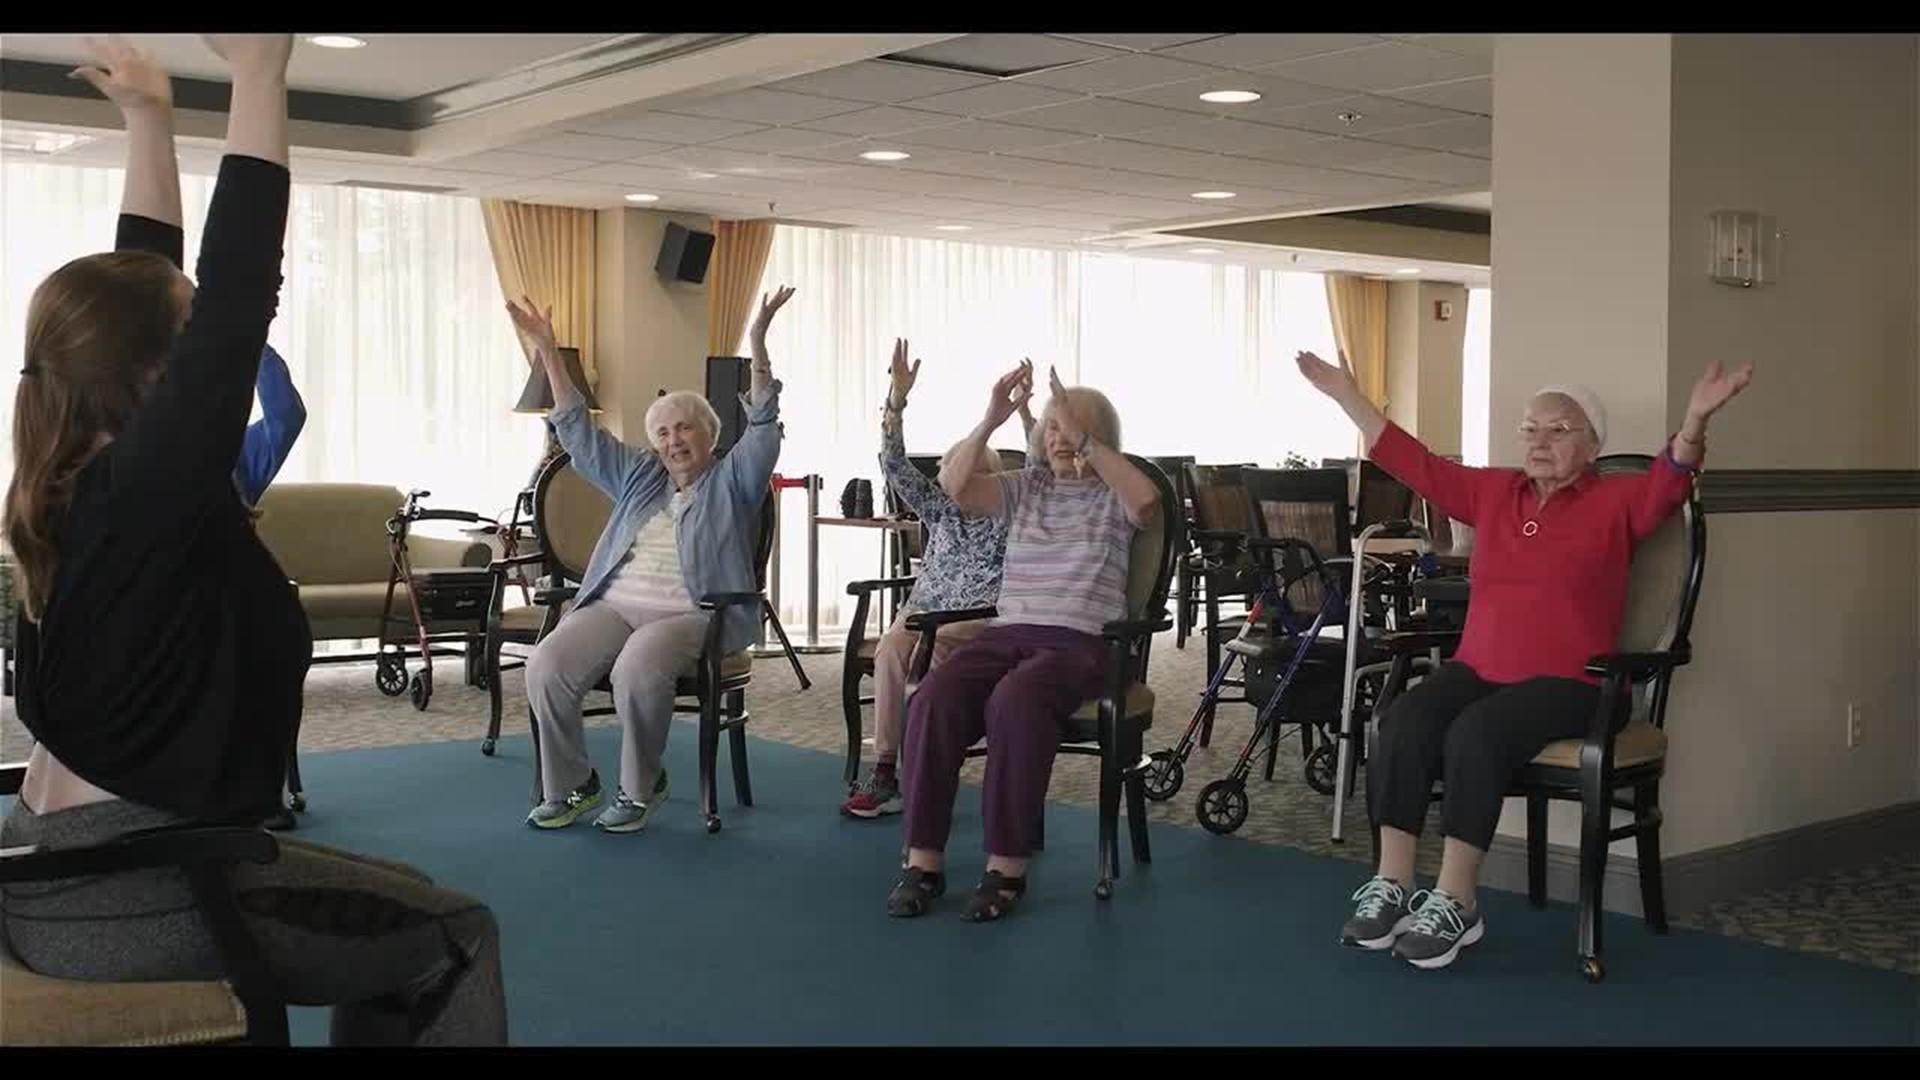 After Injury Former Pro Ballerina Finds Purpose Teaching Seniors Chair Ballet Wthr Com